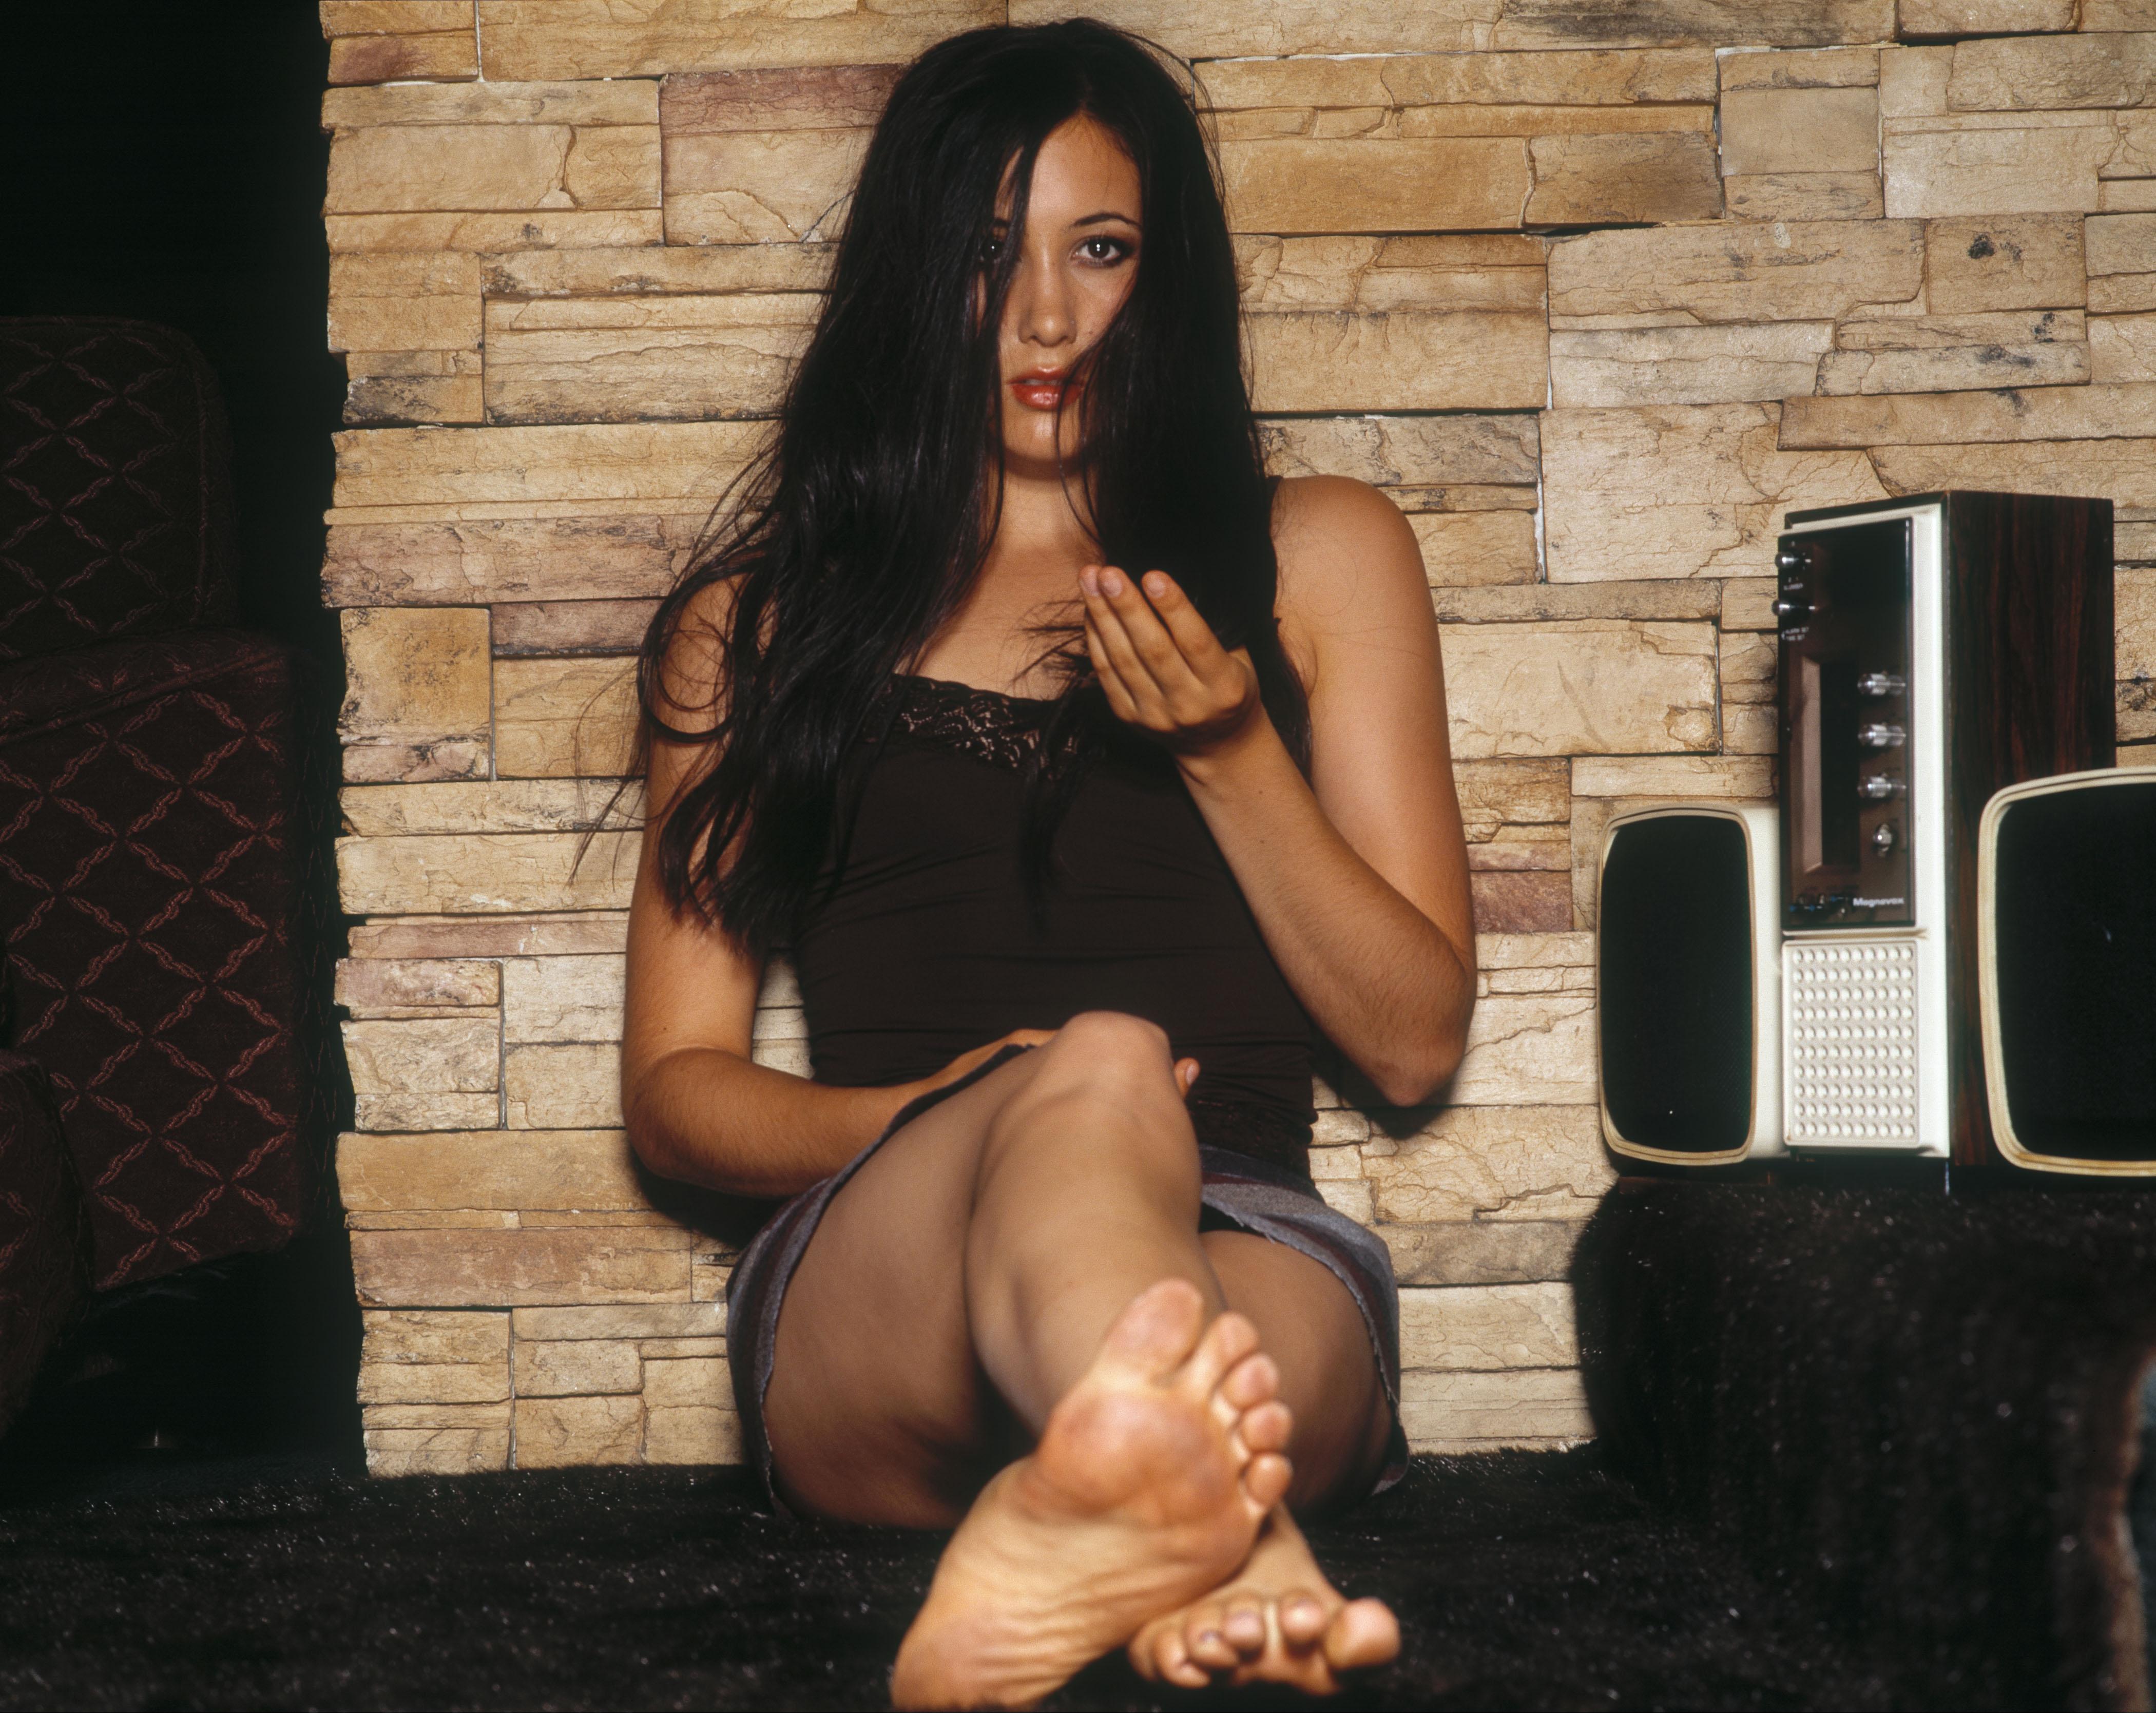 Raven hot mature wrinkled soles 9